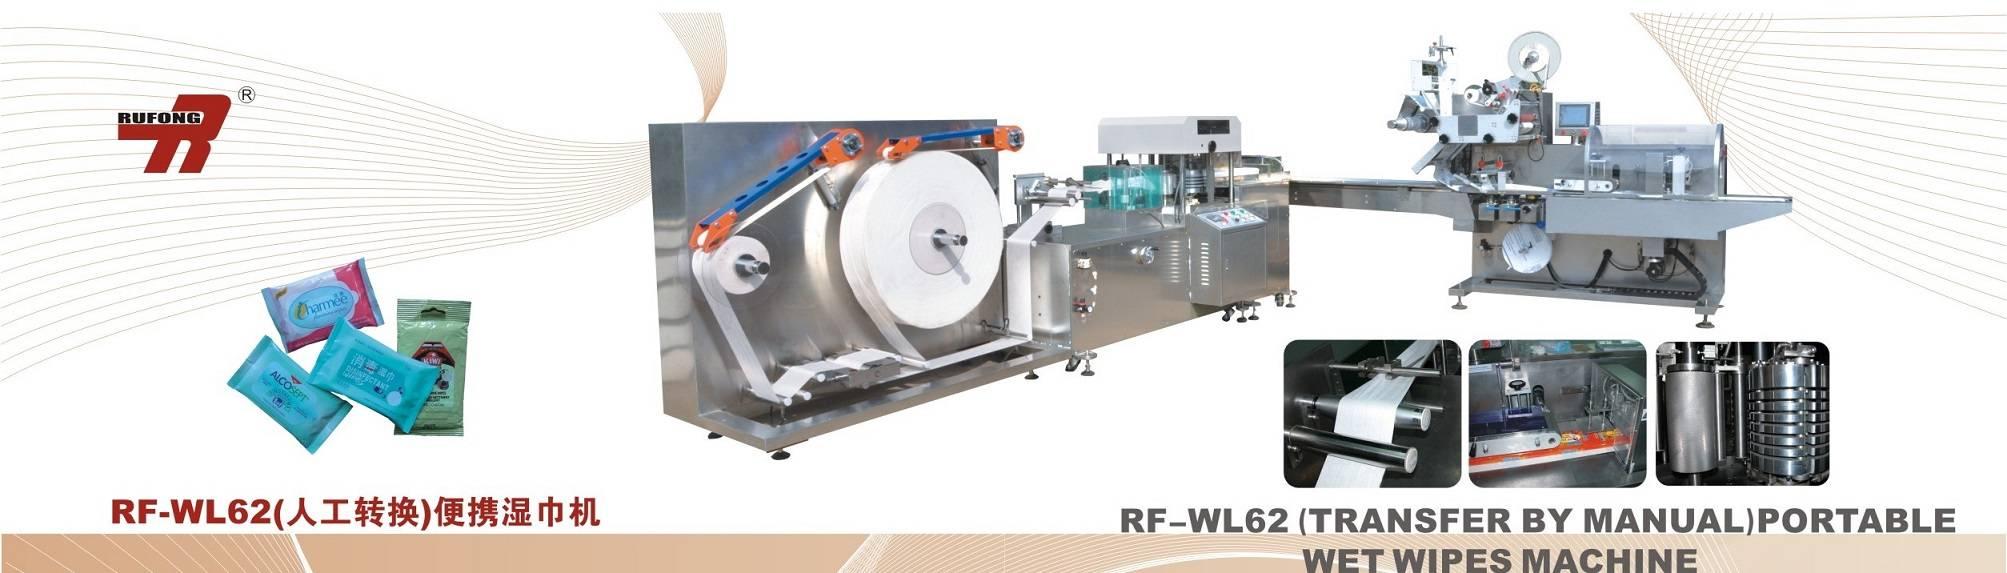 RF-WL62(Transfer By Manual) Portable Wet Wipes Machine